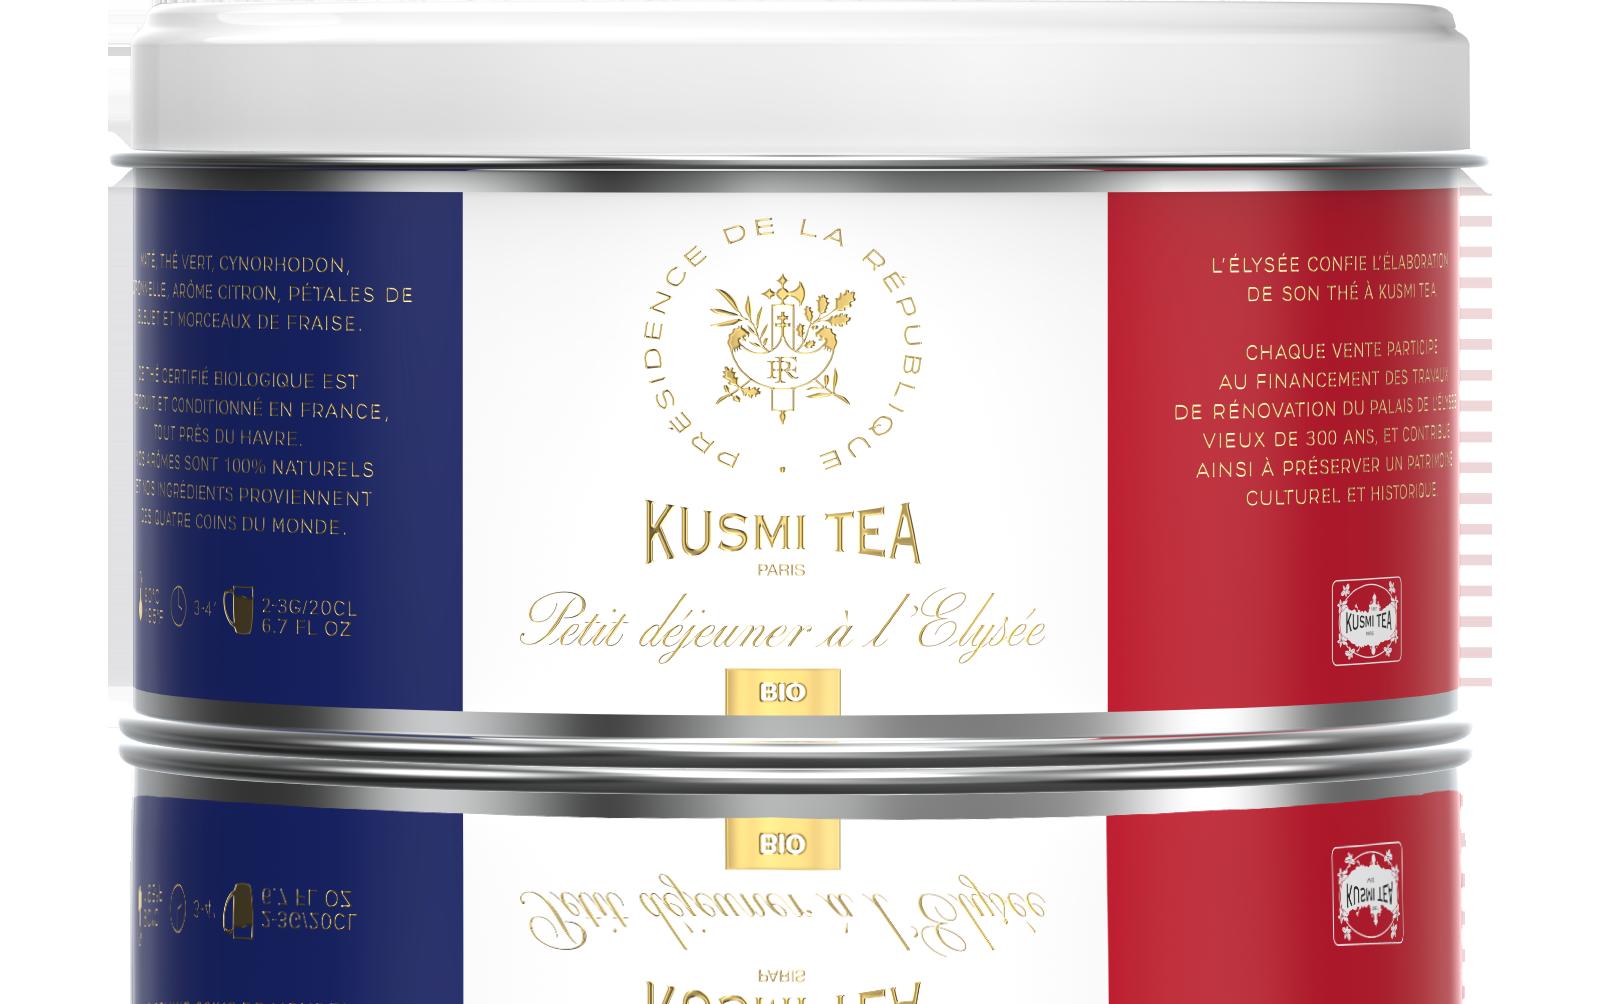 Thé vert, maté - Petit déjeuner à l'Elysée bio - Vrac - Kusmi Tea